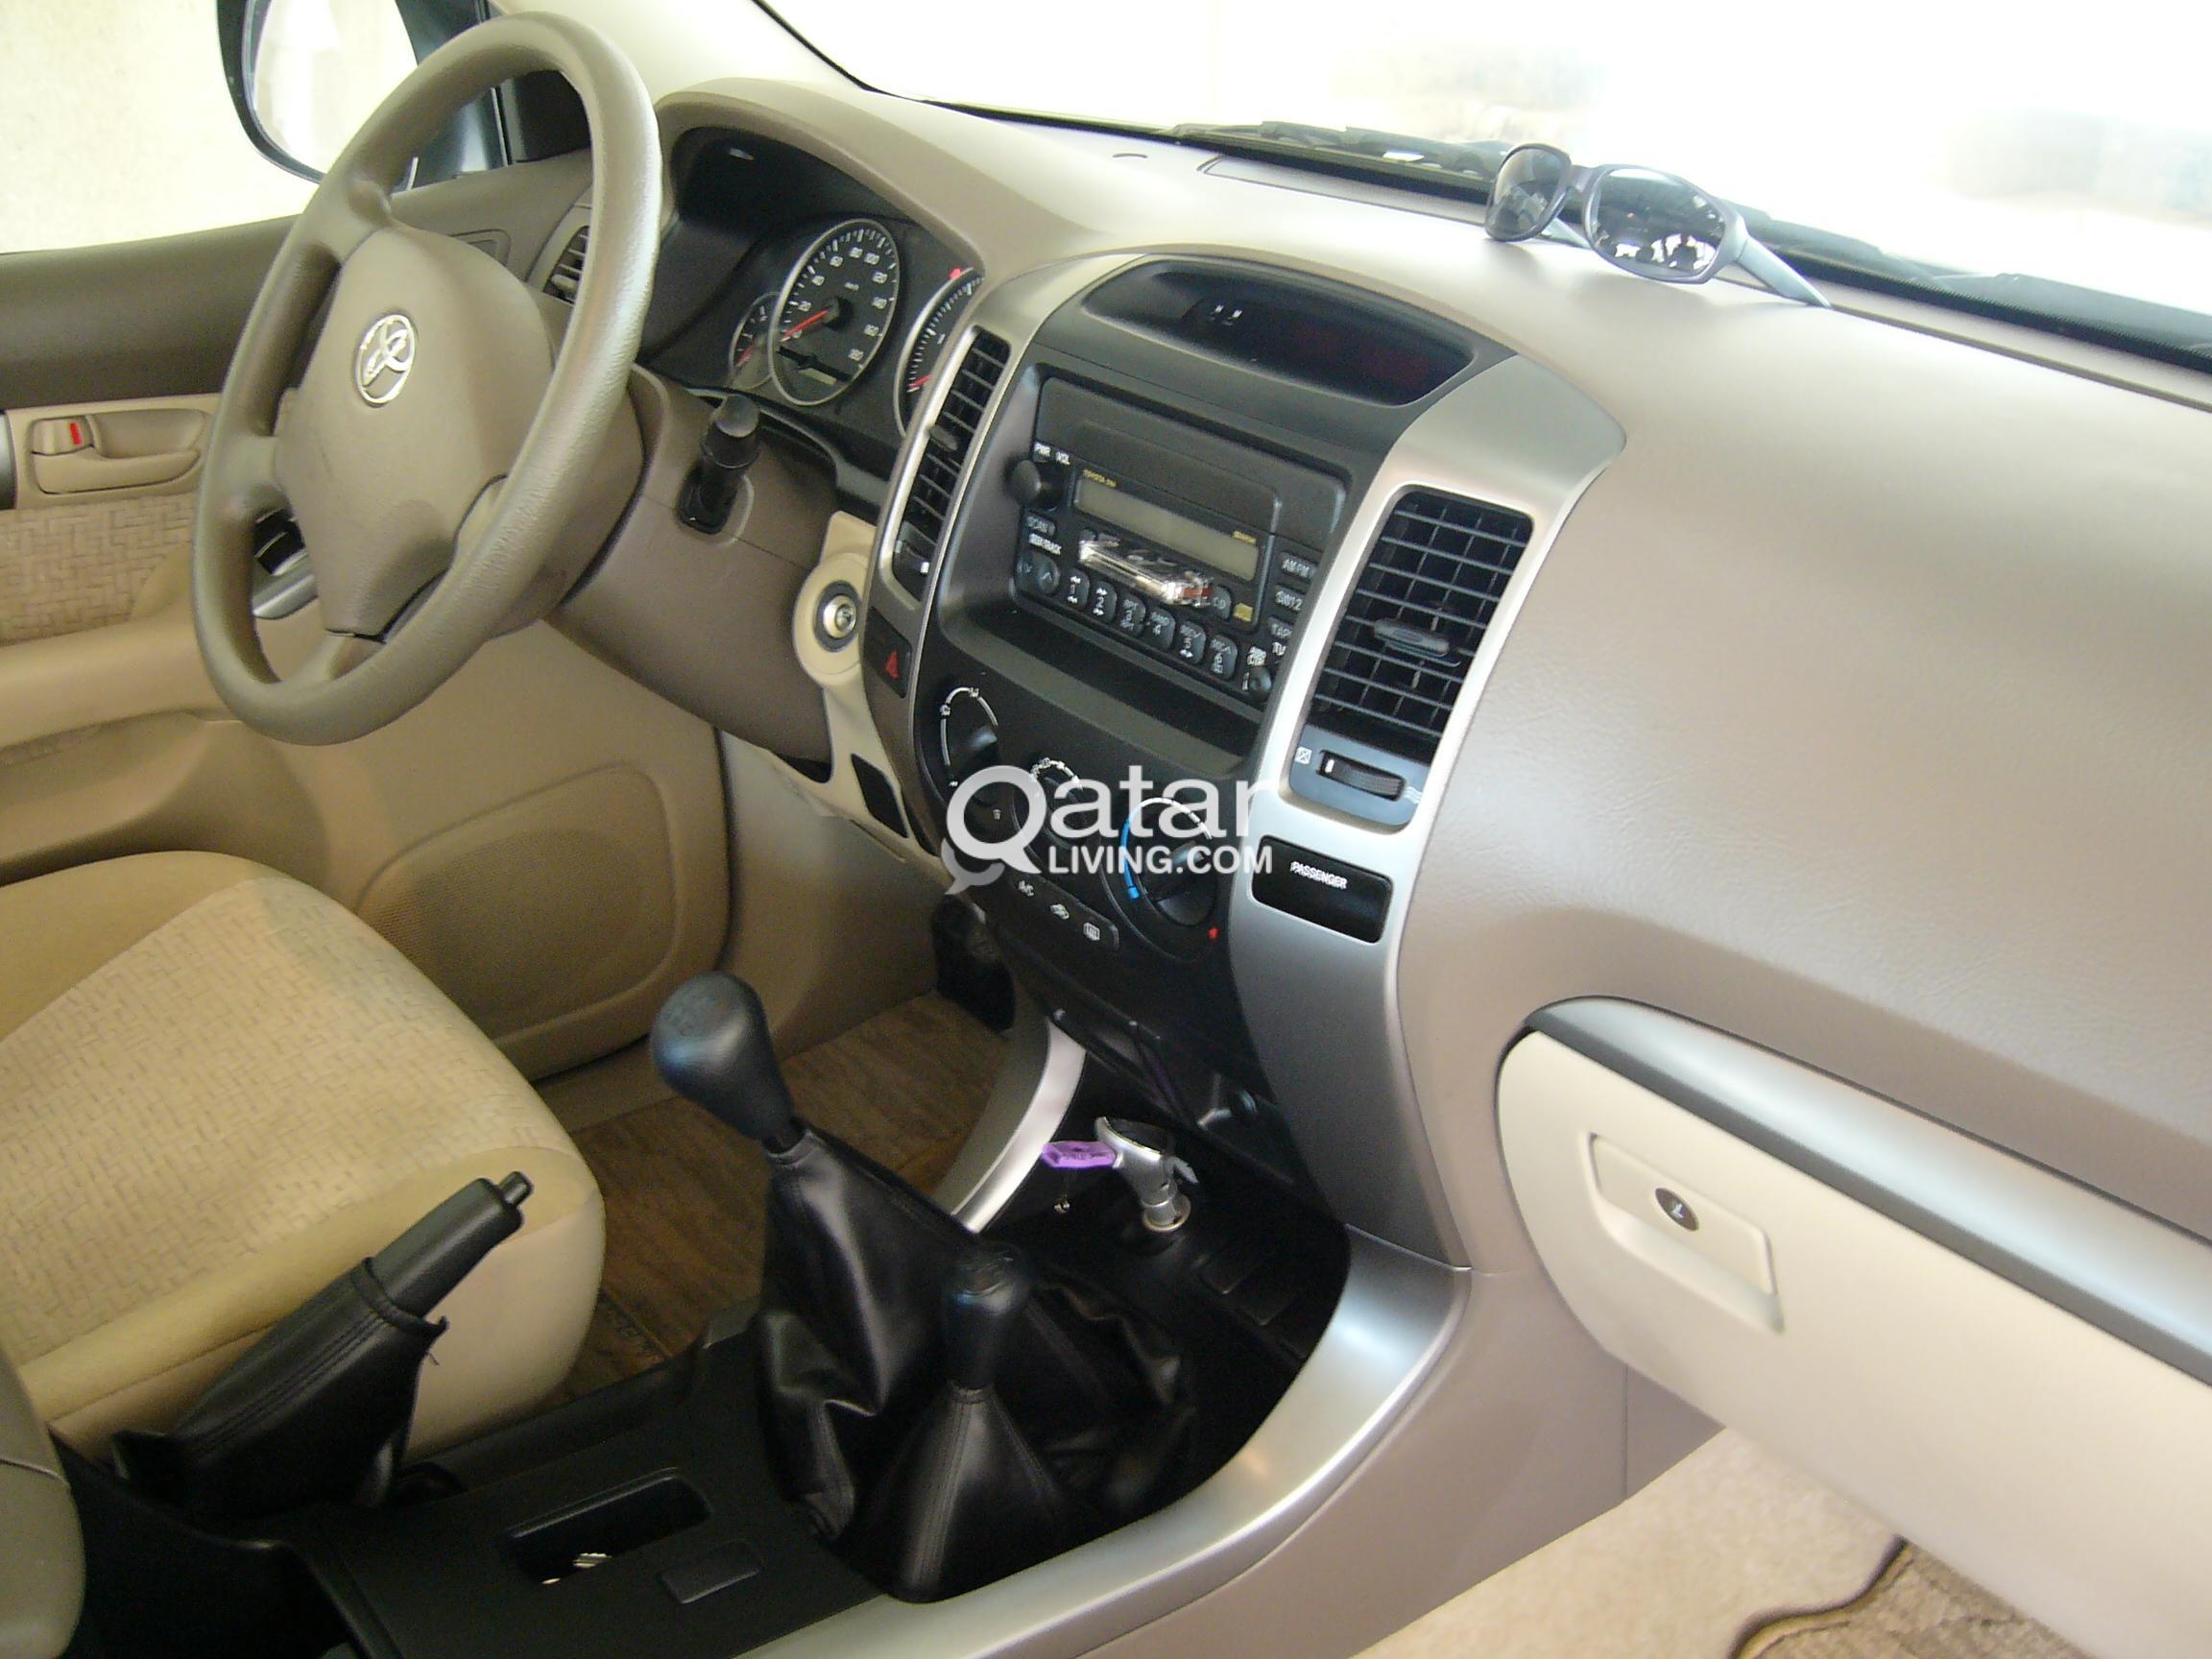 for sale toyota prado 2007 diesel engine manual gearbox qatar living rh qatarliving com prado manual pdf pardo manuel doctor